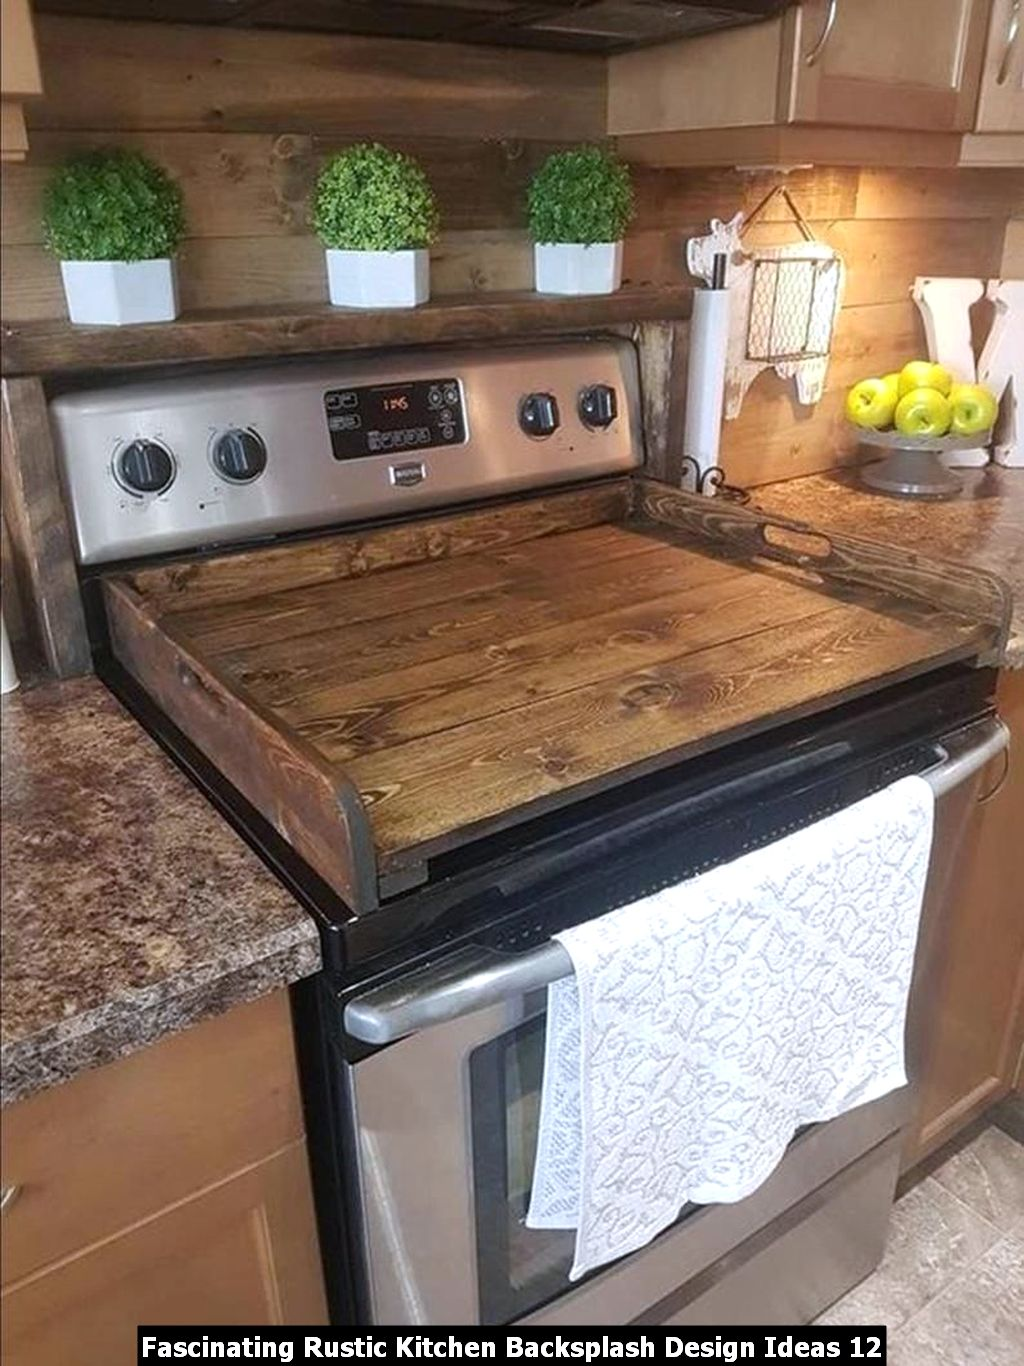 Fascinating Rustic Kitchen Backsplash Design Ideas 12